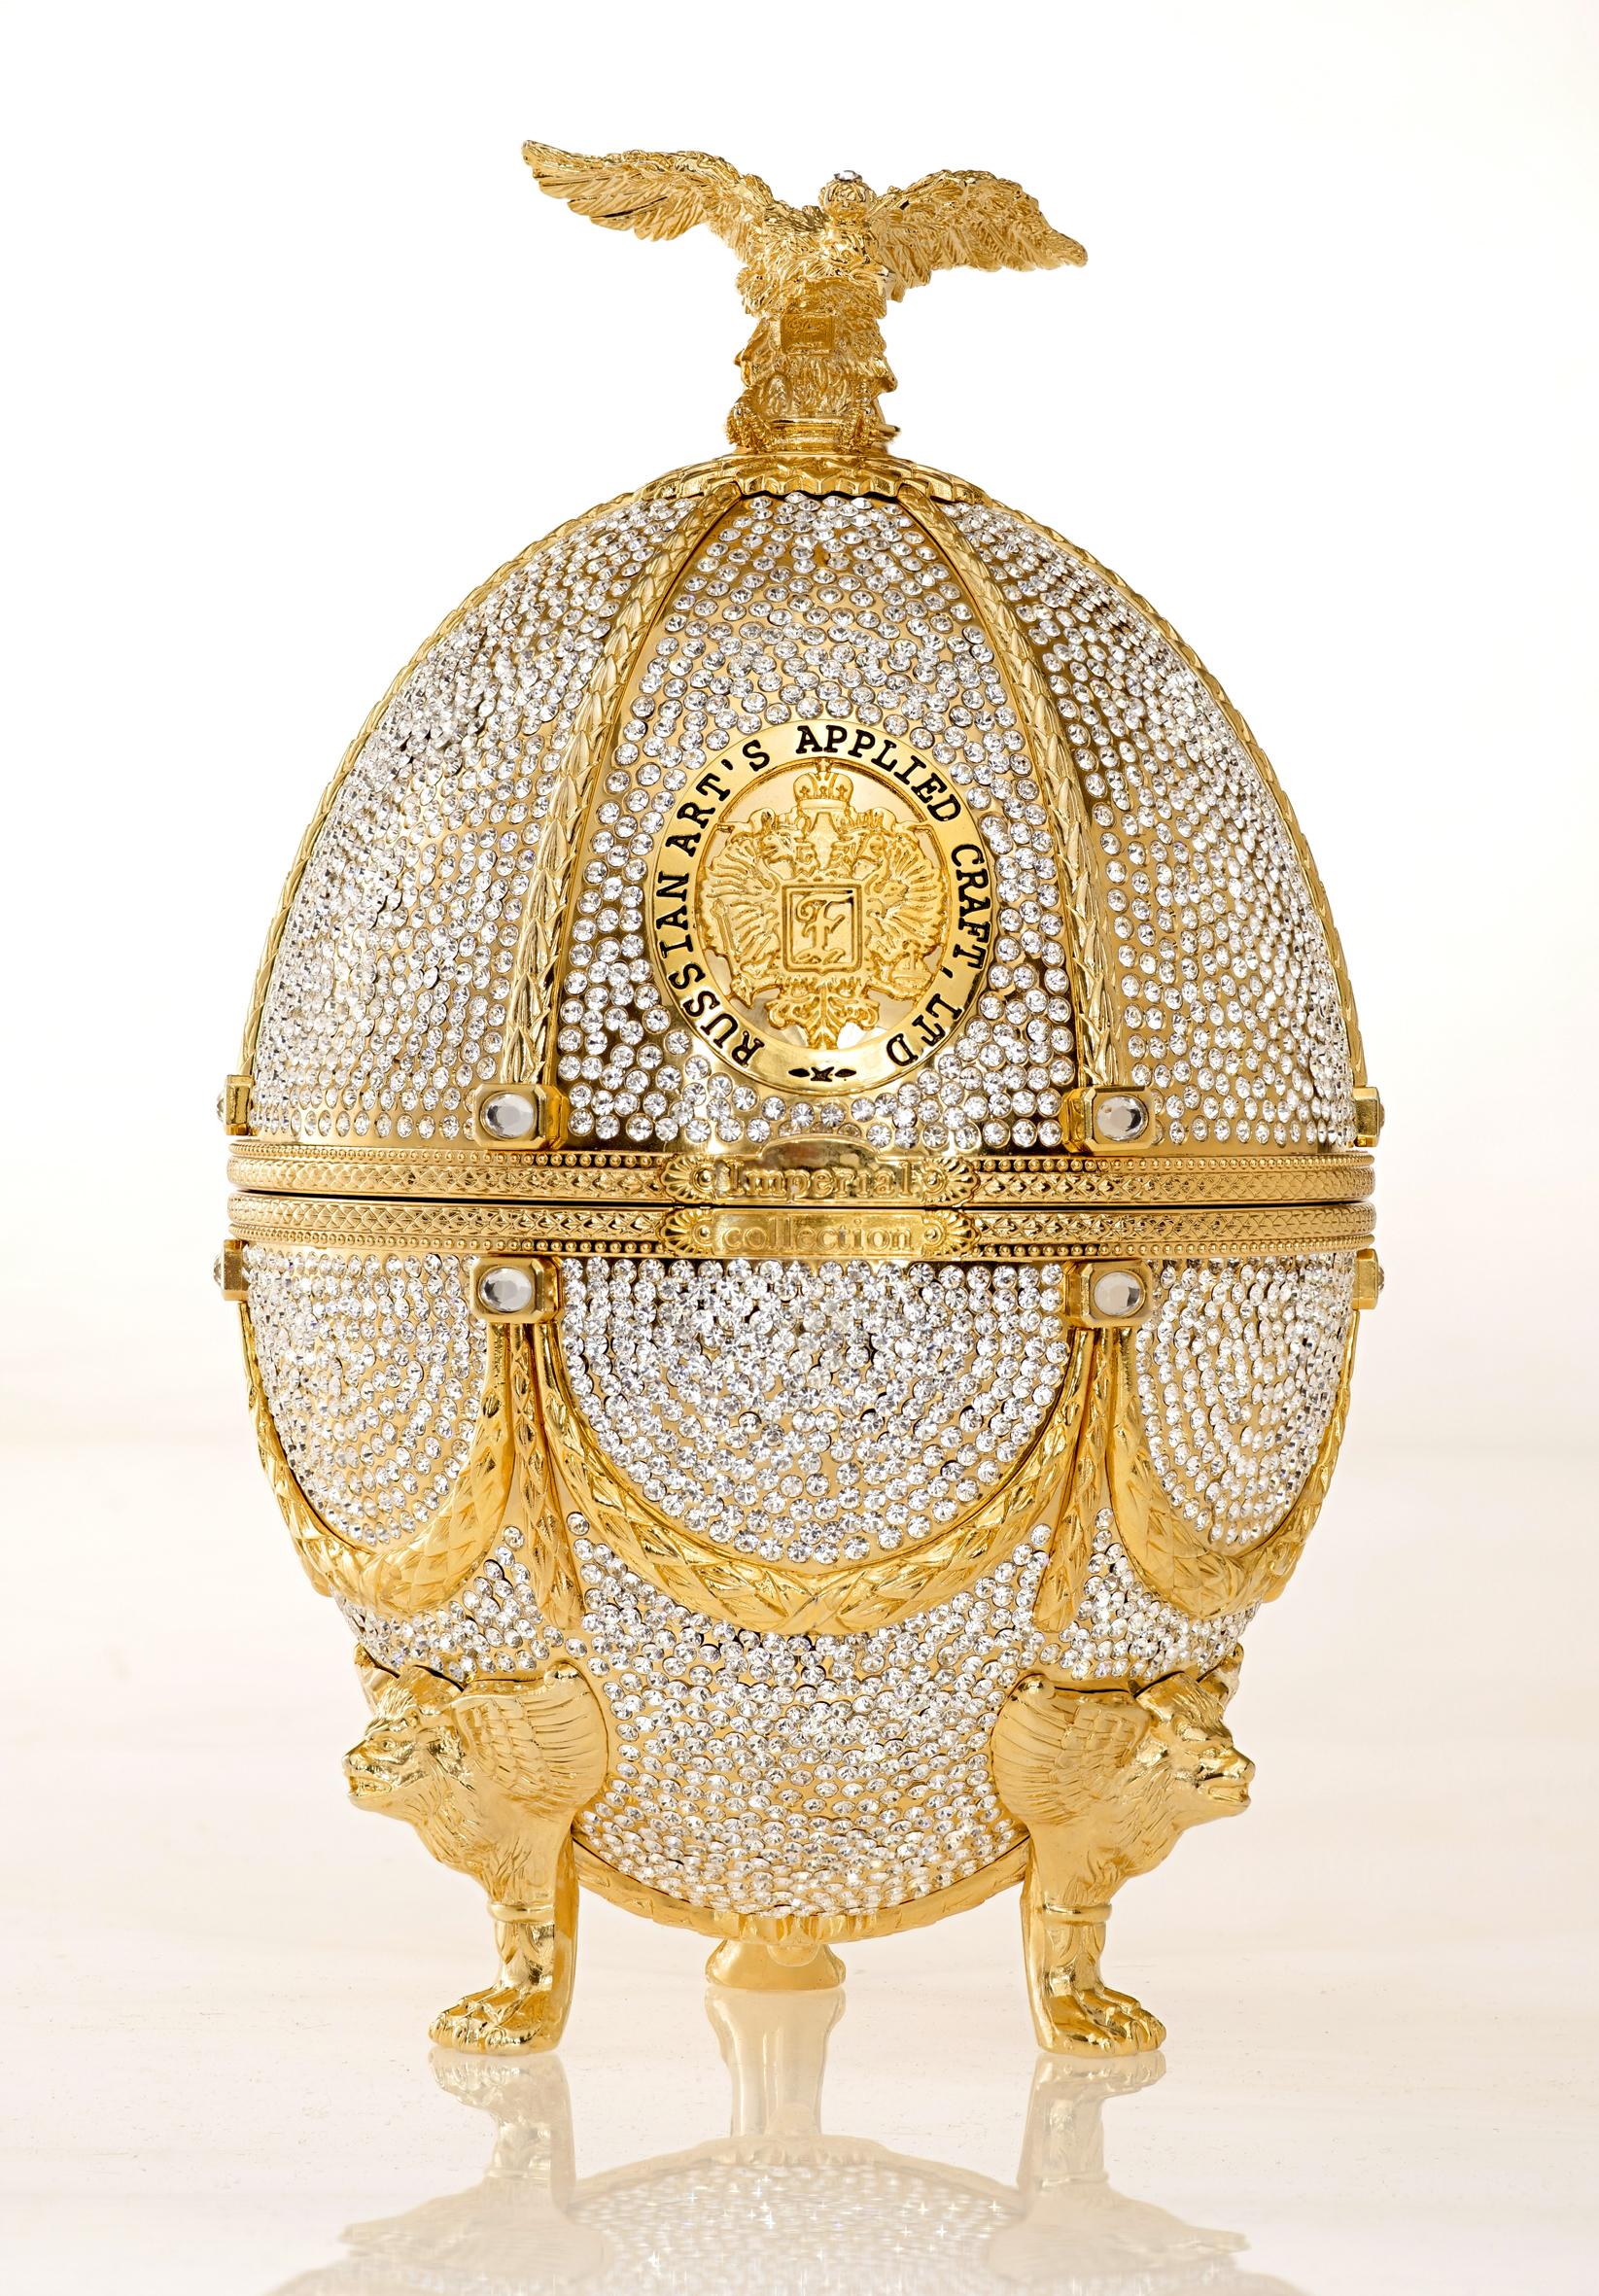 Vodka Imperial Collection Super Premium Oeuf Fabergé Diamond avec cristaux Swarovski